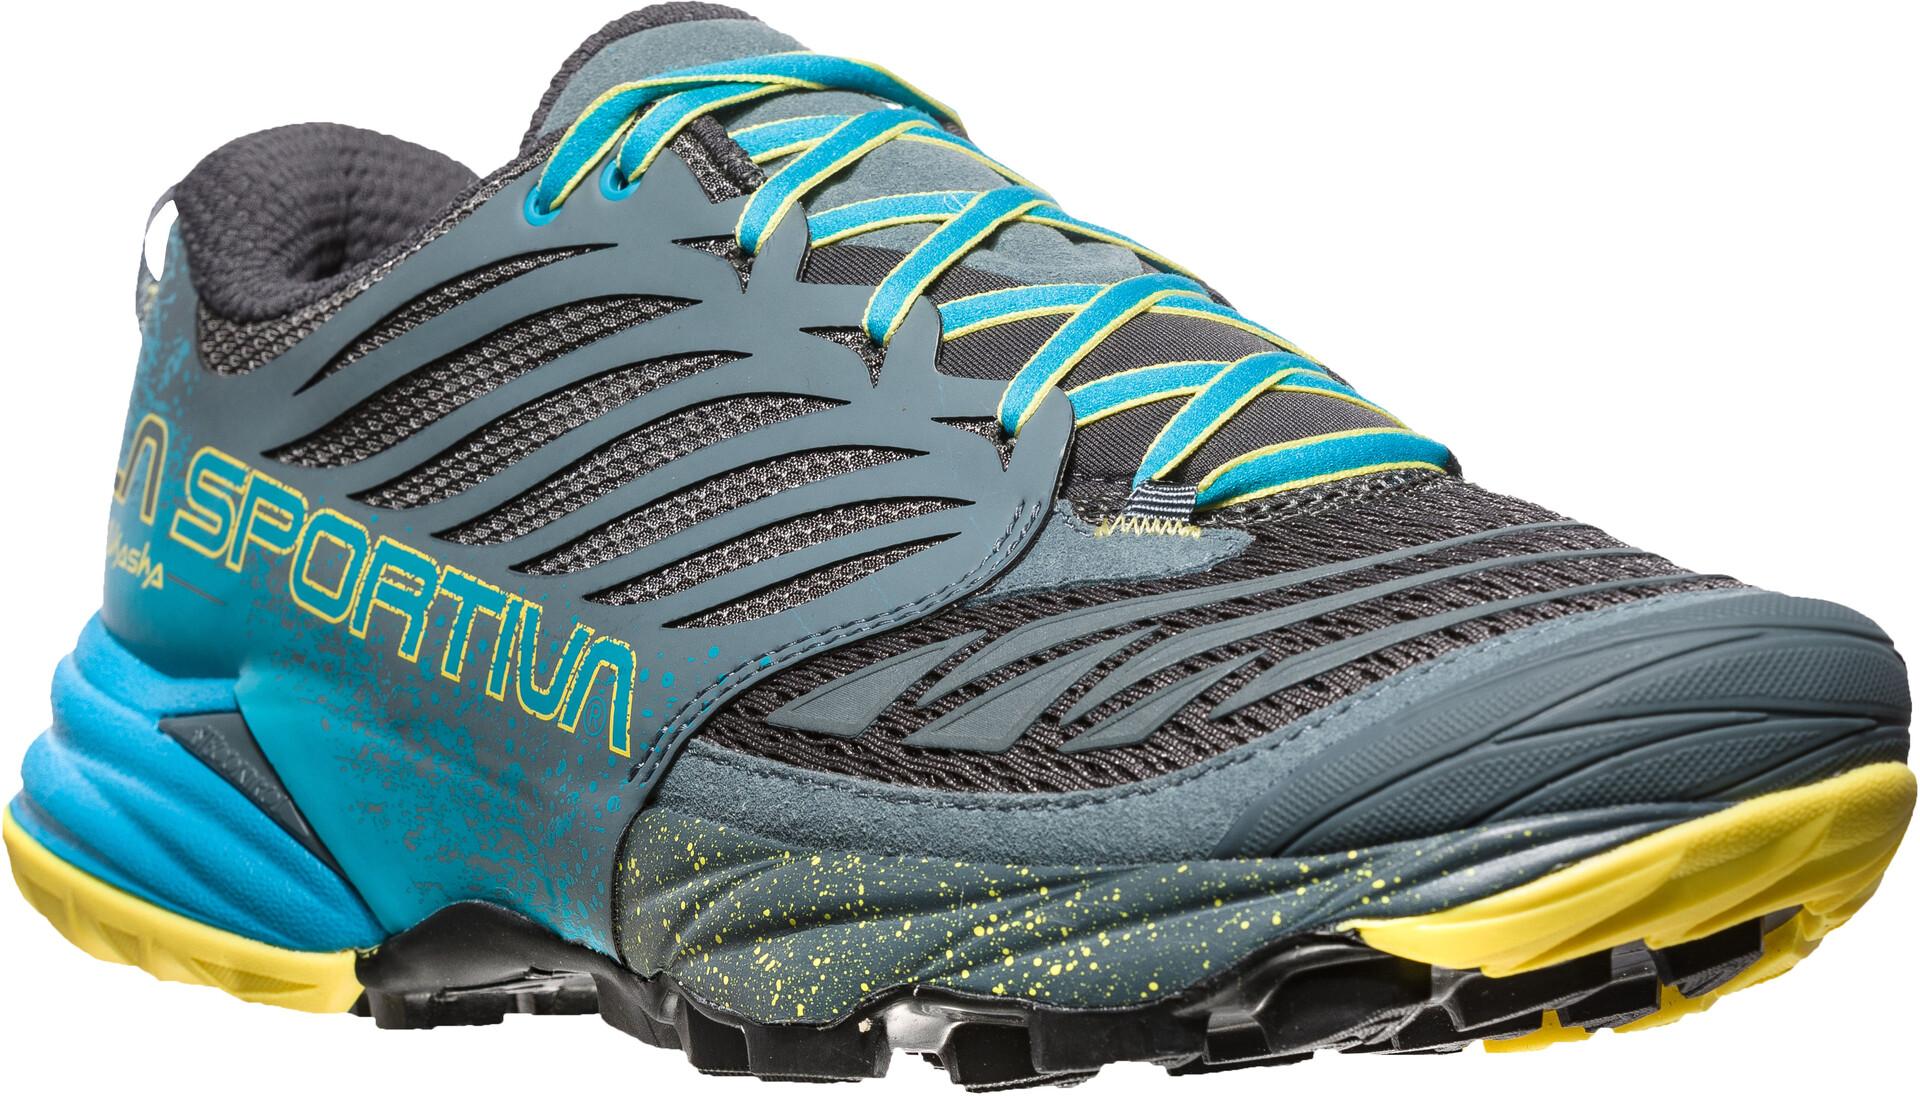 Sportiva La Running Sur Akasha Chaussures Homme Gristurquoise SzjqMUVpLG